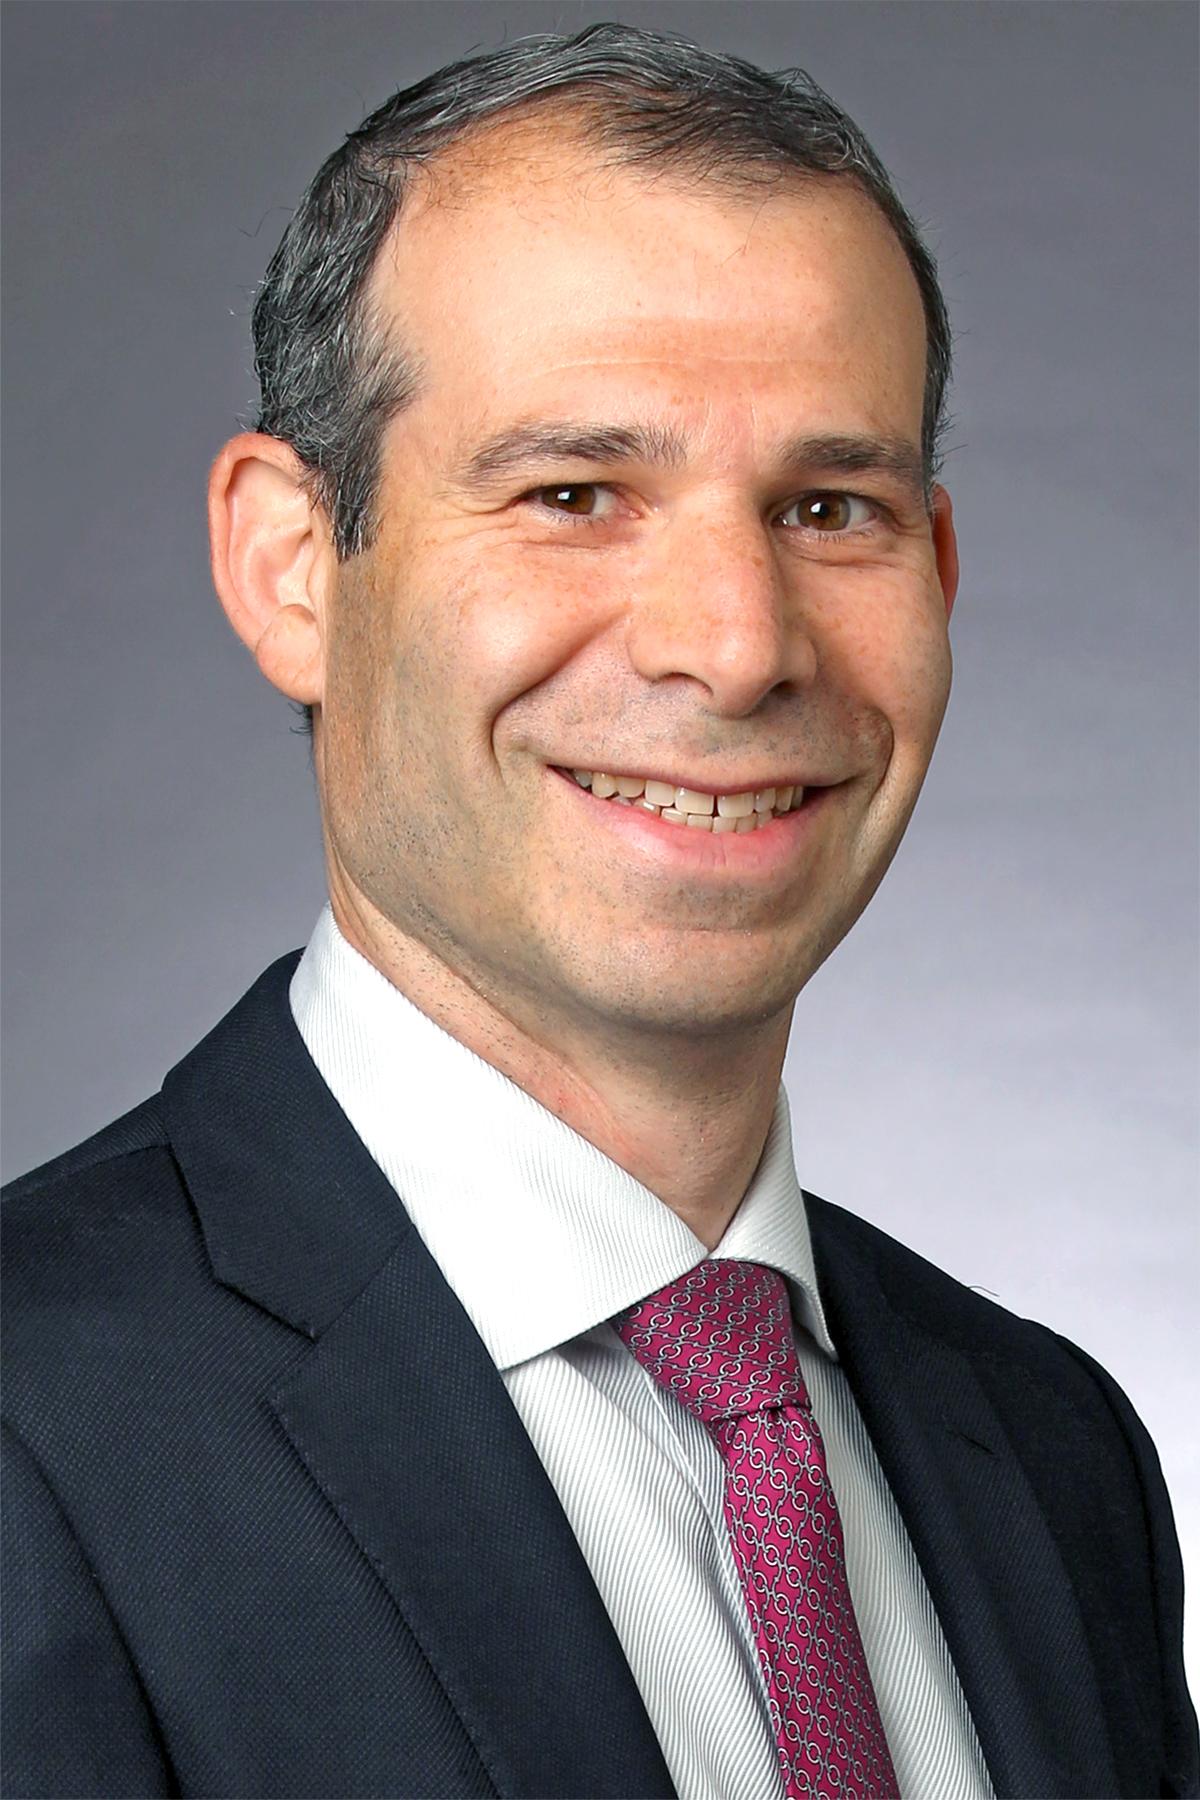 A Major Step Forward In Orthopedics At Newyork